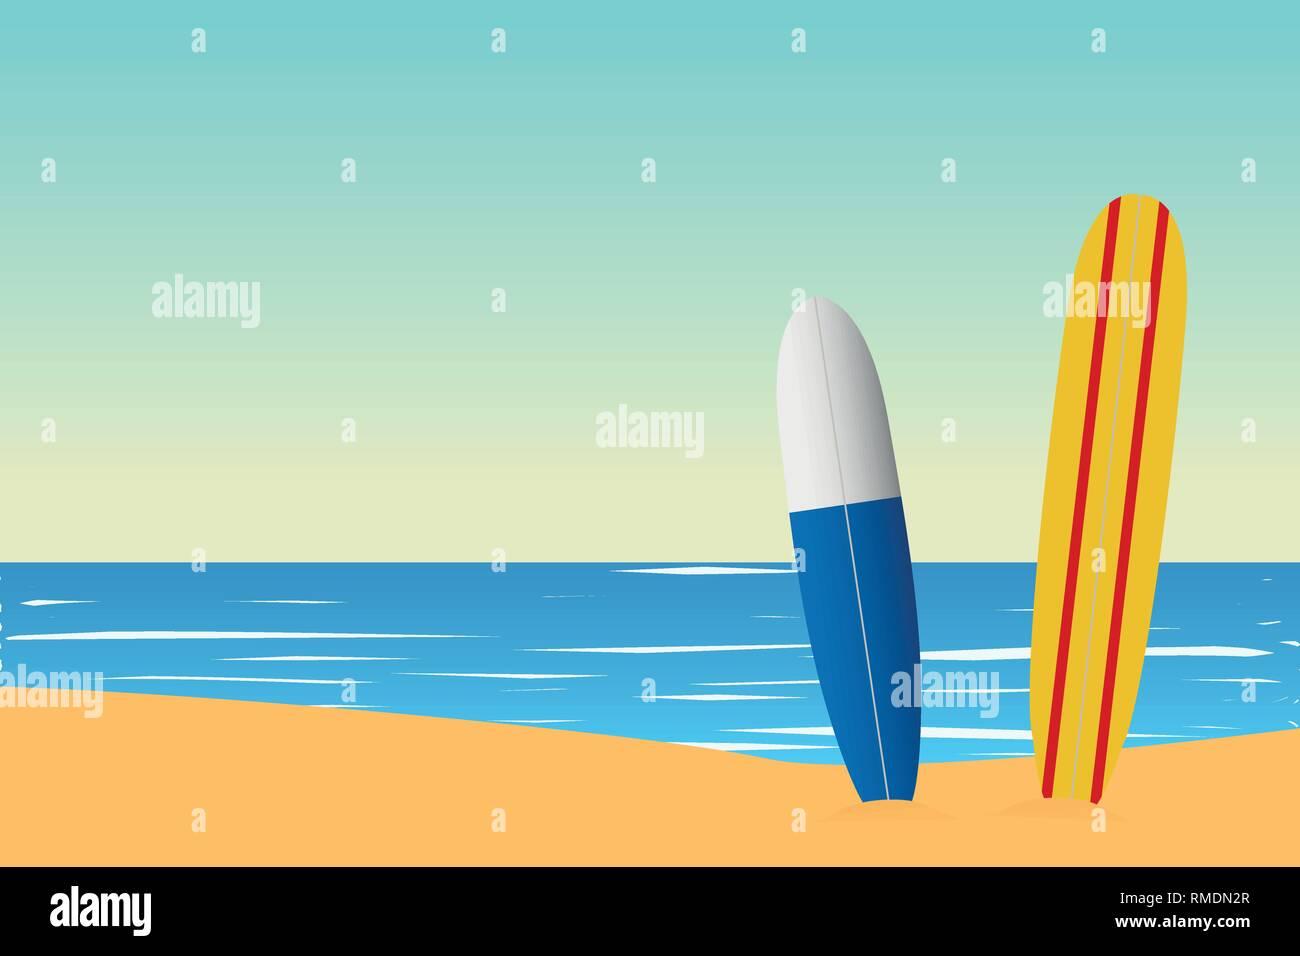 Tropical landscape. Seascape. Summer background. Surfing board. Flat style illustration. Vector illustration - Stock Vector